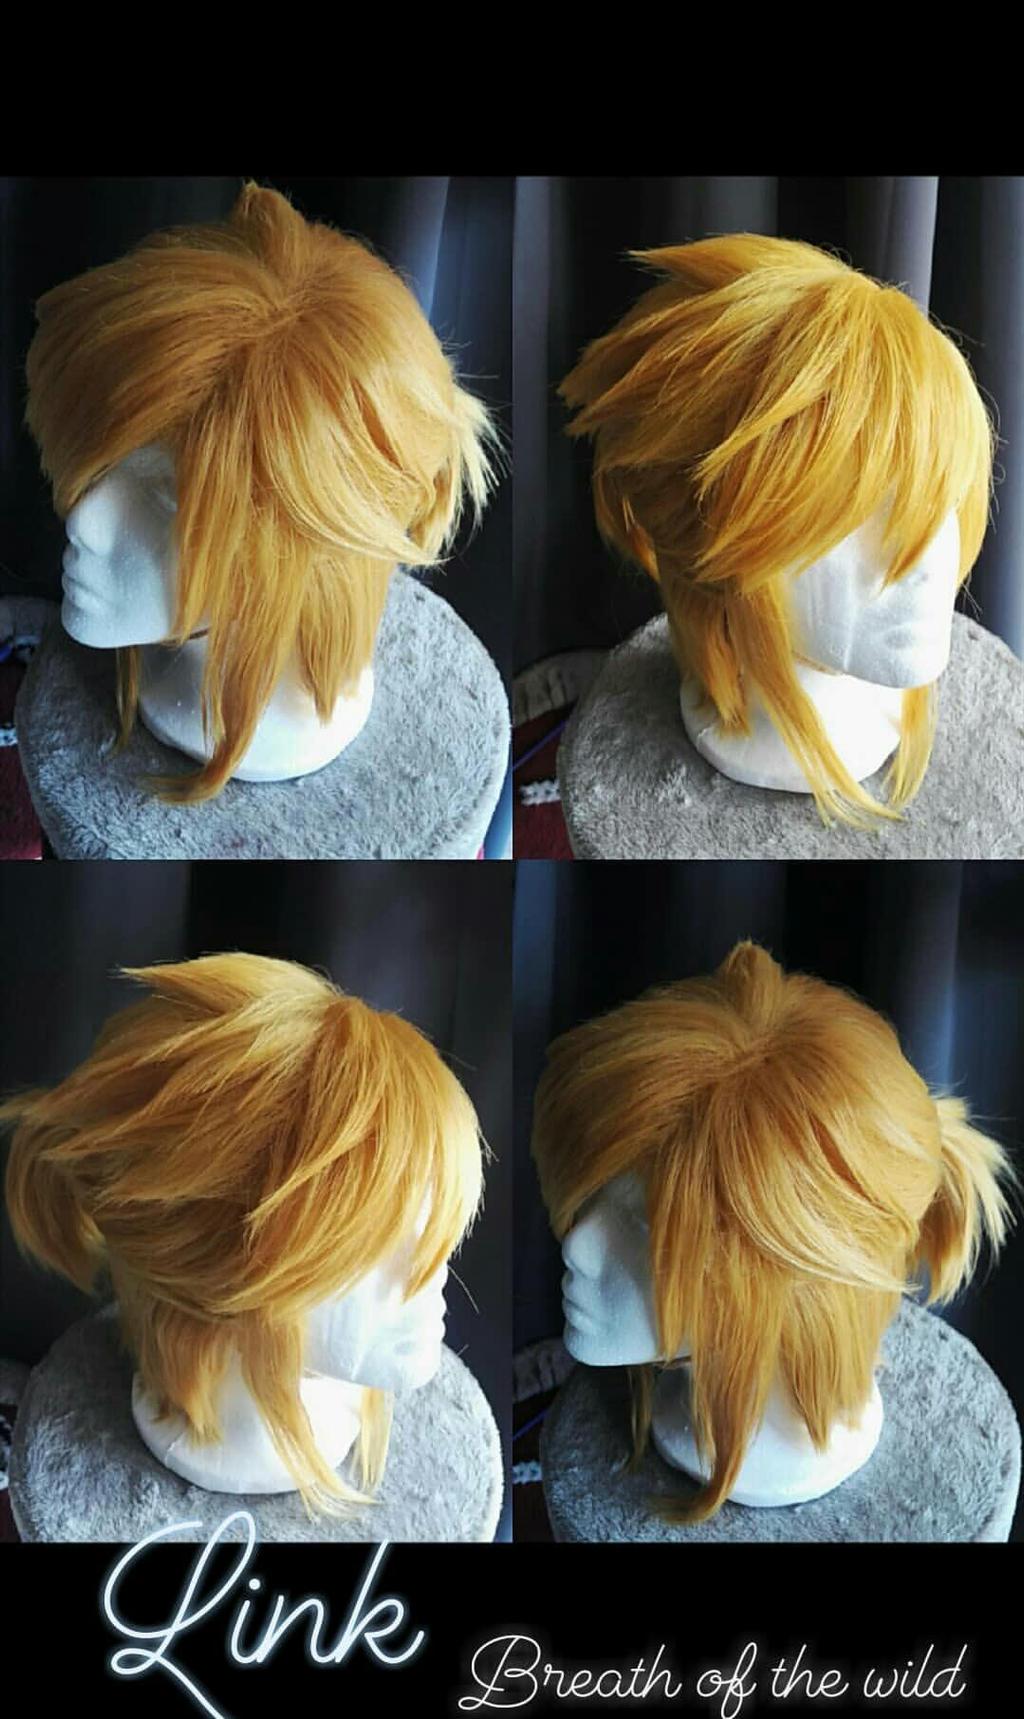 Link Zelda Breath Of The Wild Wig By Nodoka54 On Deviantart